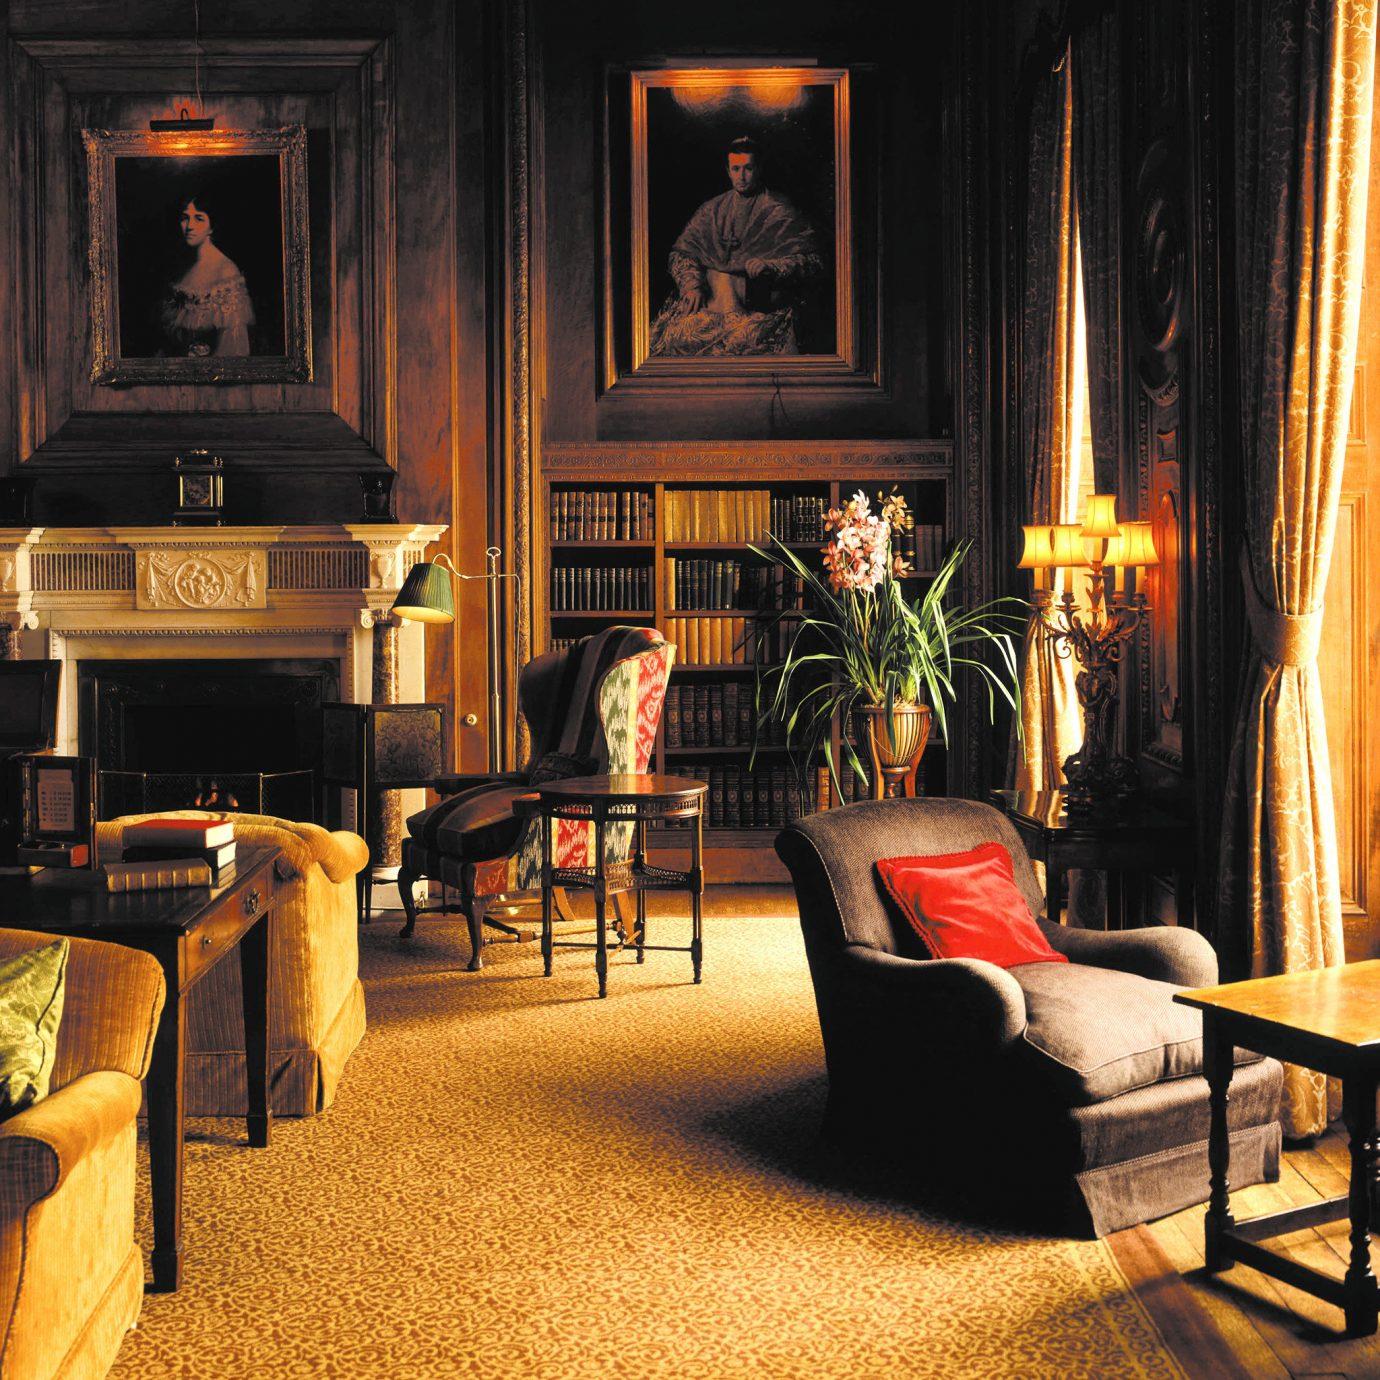 Elegant Fireplace Historic Lounge chair living room home lighting Lobby